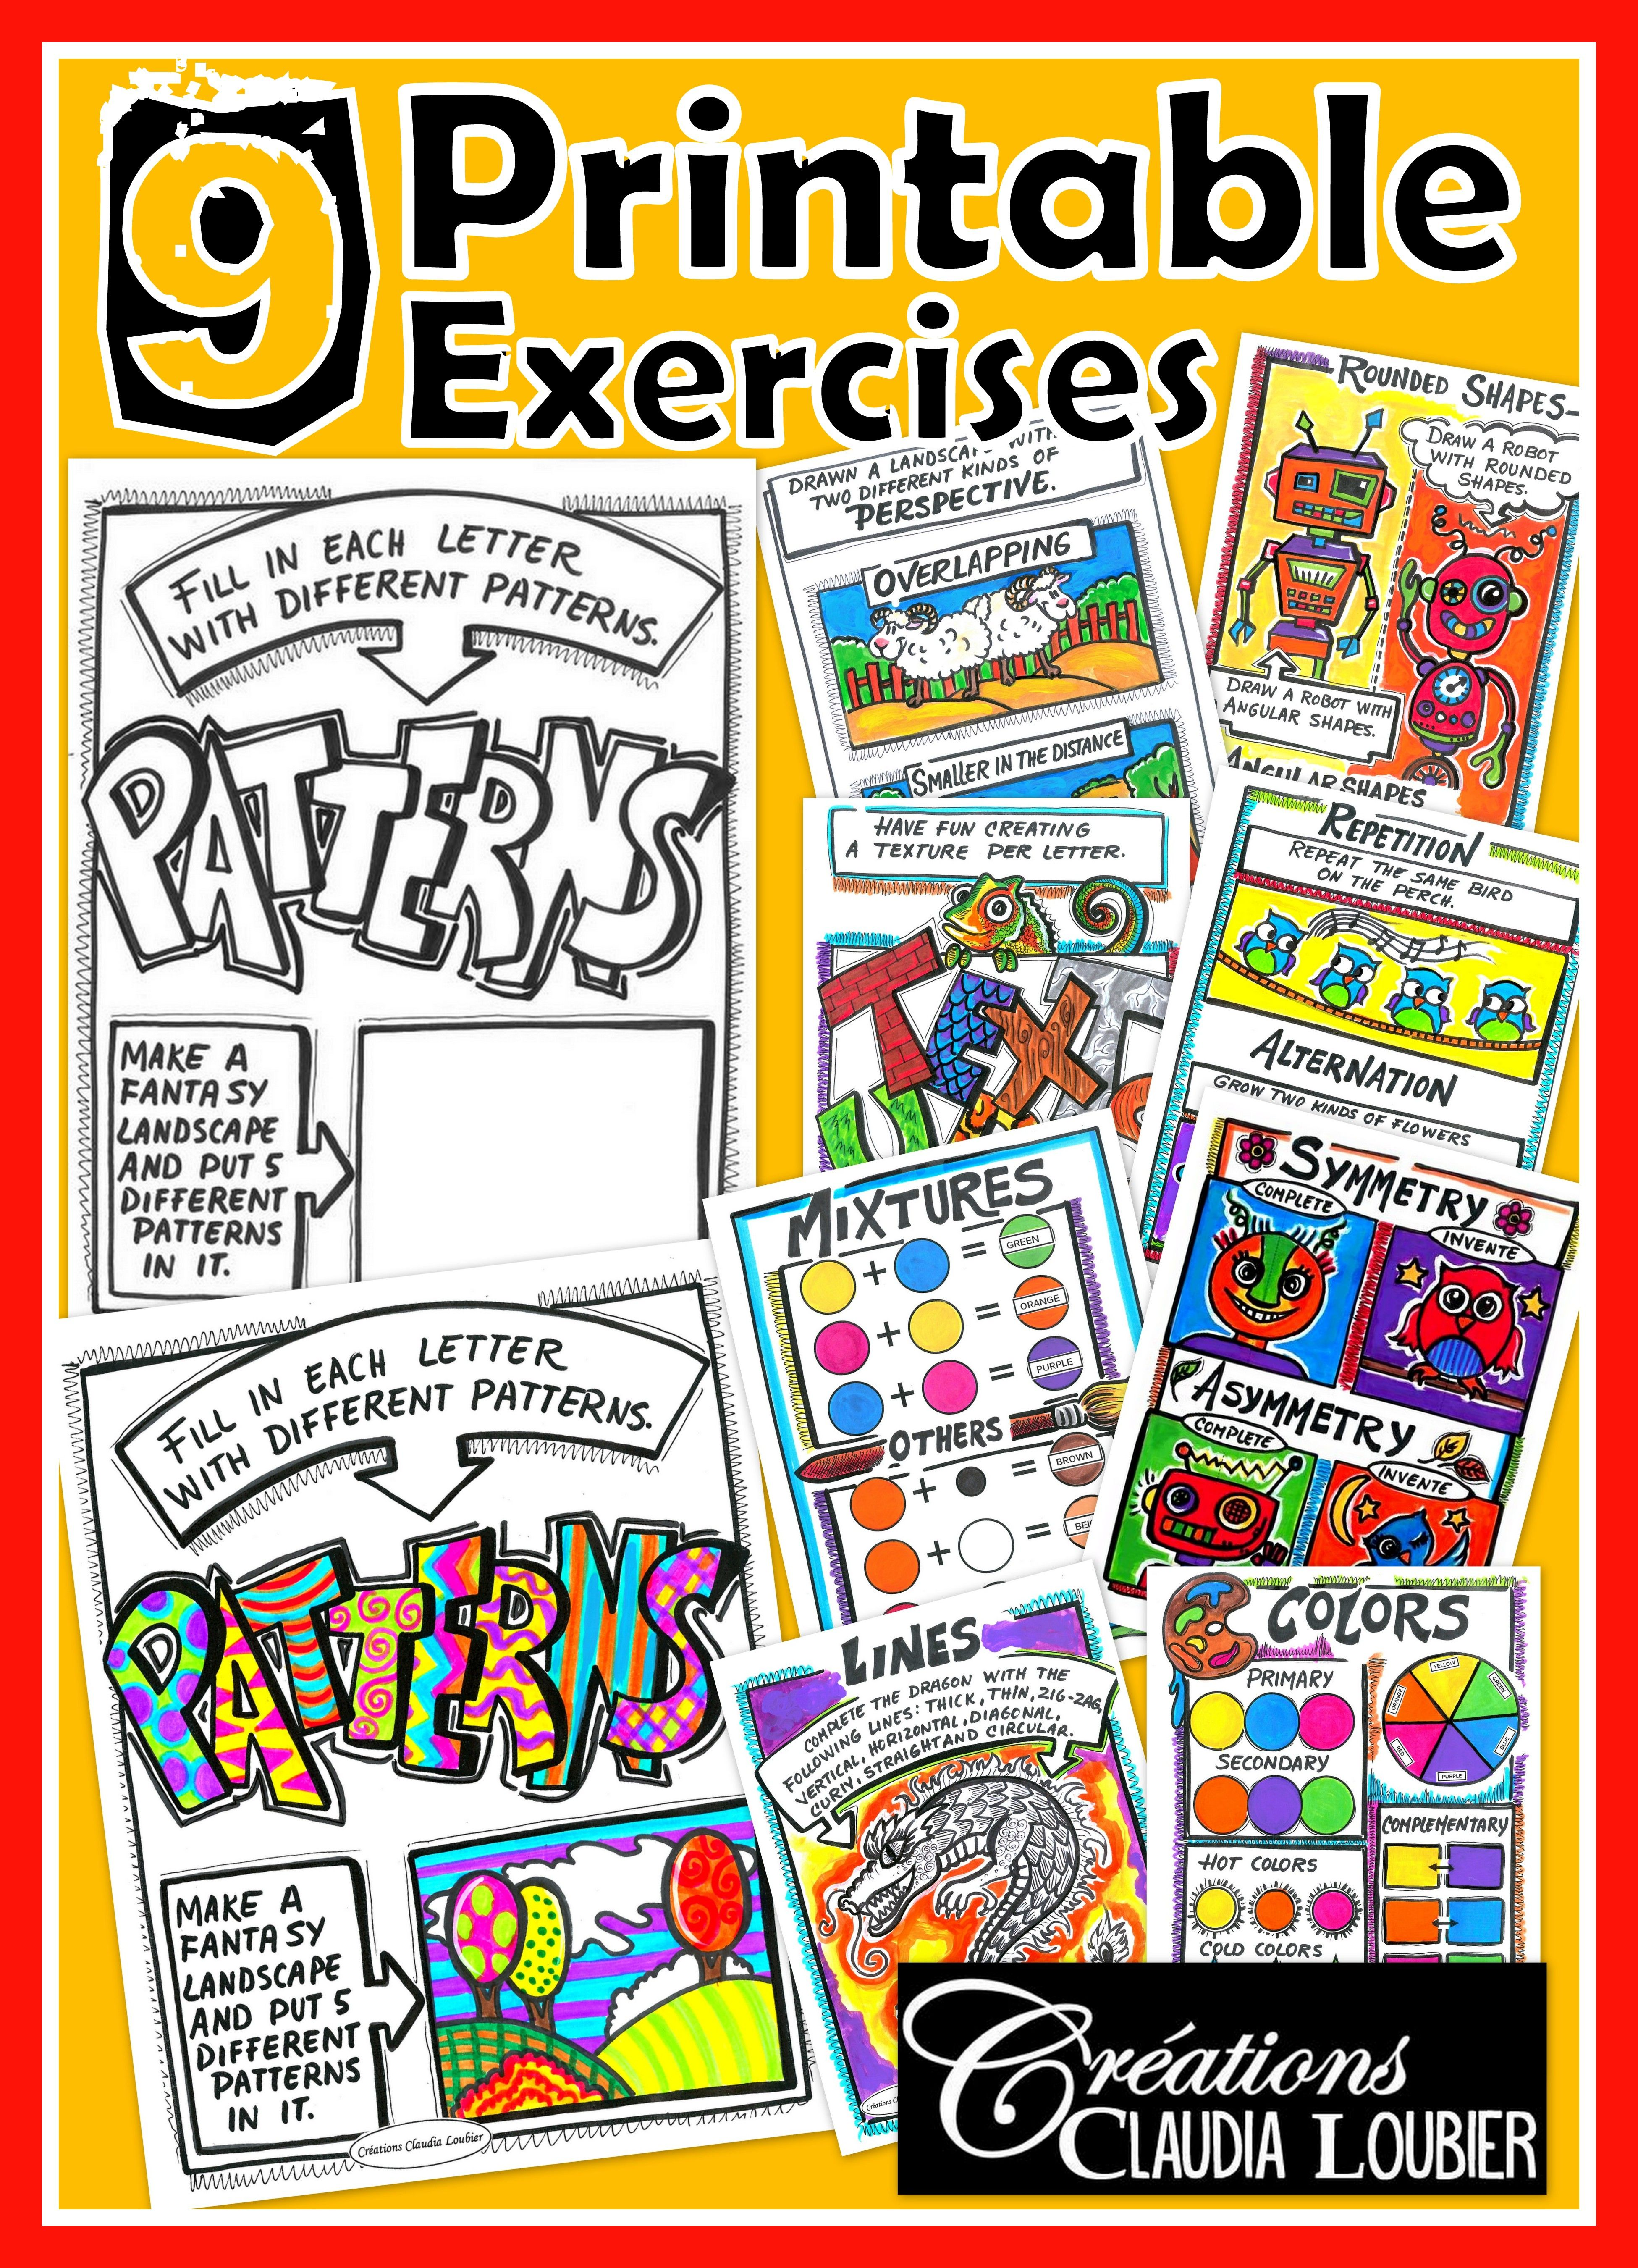 Elements Of Art 9 Printable Exercises